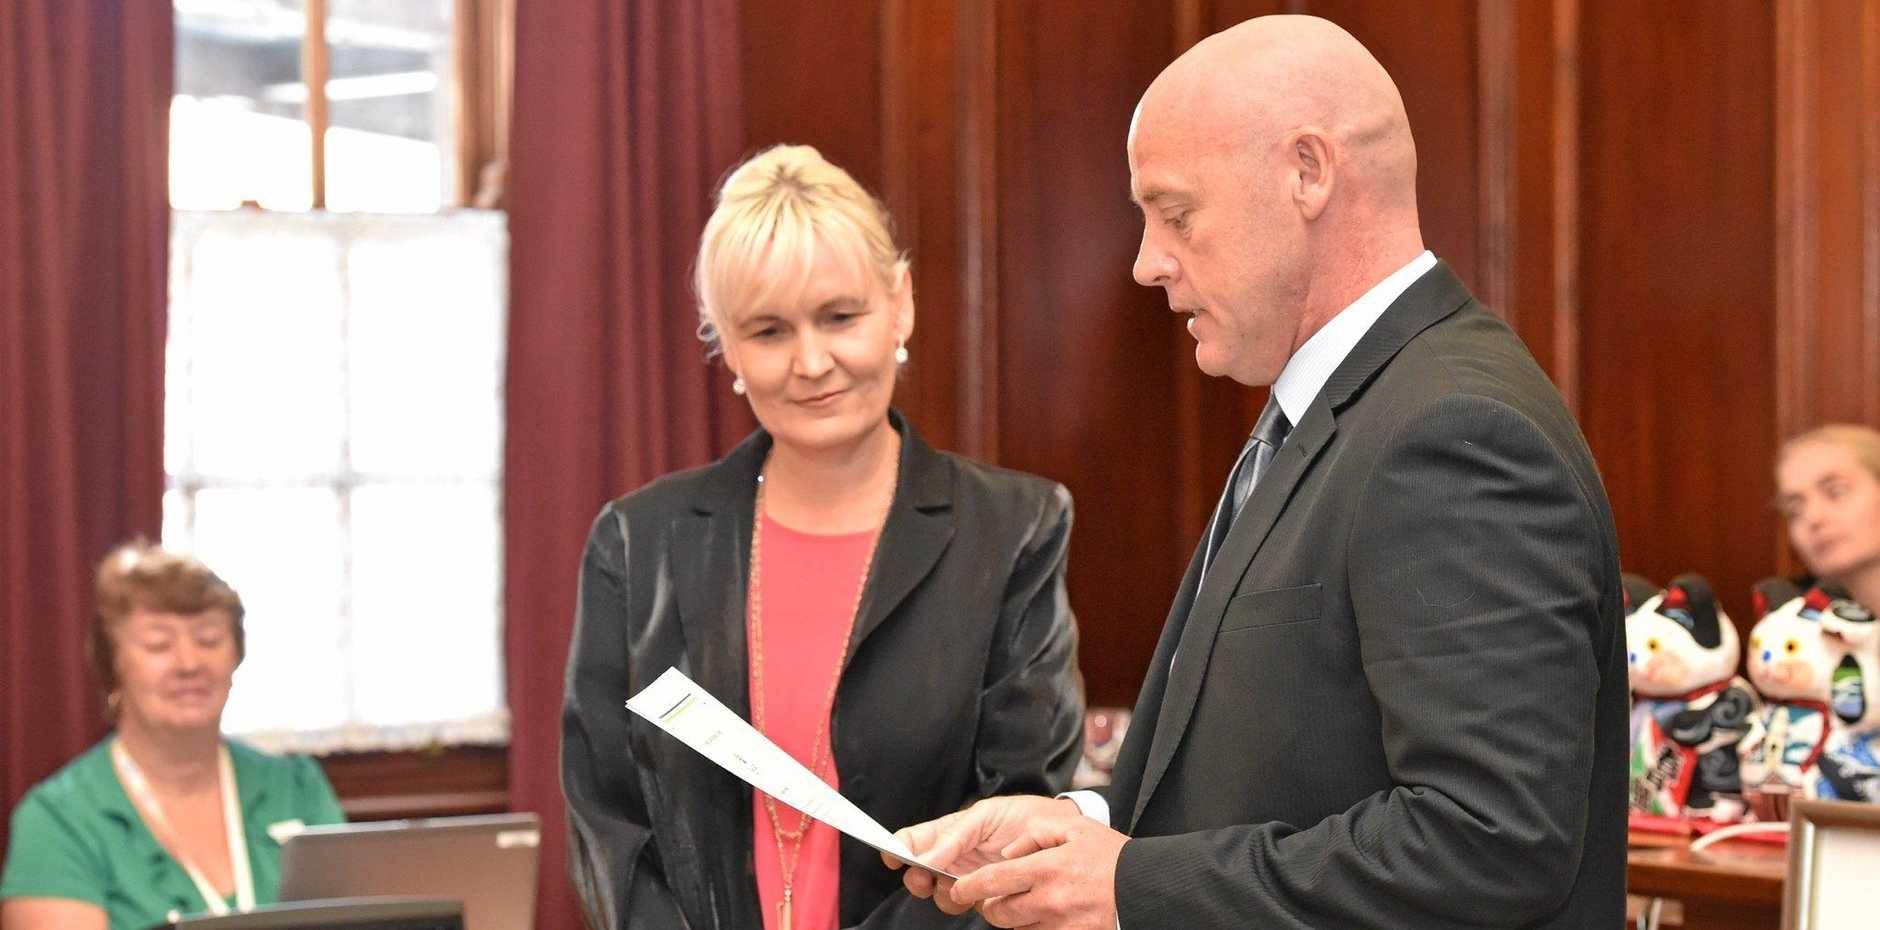 Fraser Coast Regional Council - Cr. Darren Everard is sworn in. Photo: Alistair Brightman / Fraser Coast Chronicle